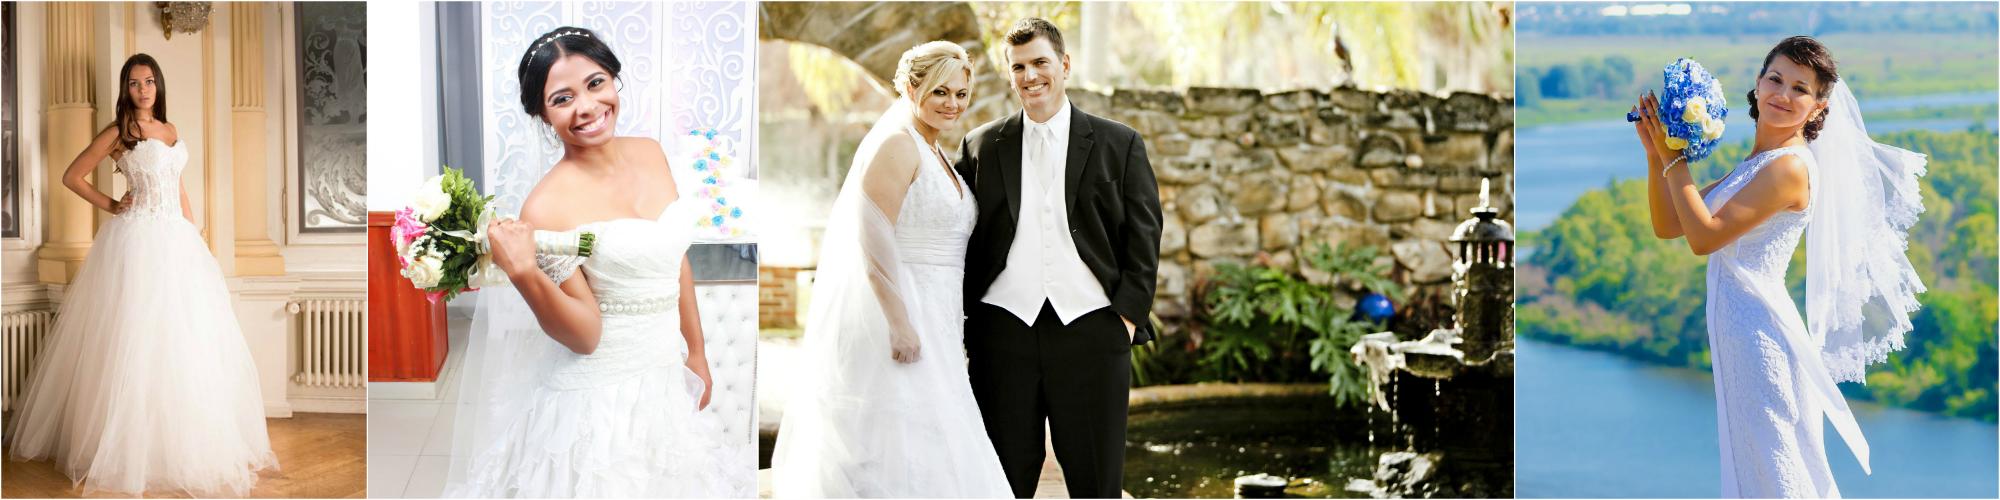 BrideCollage